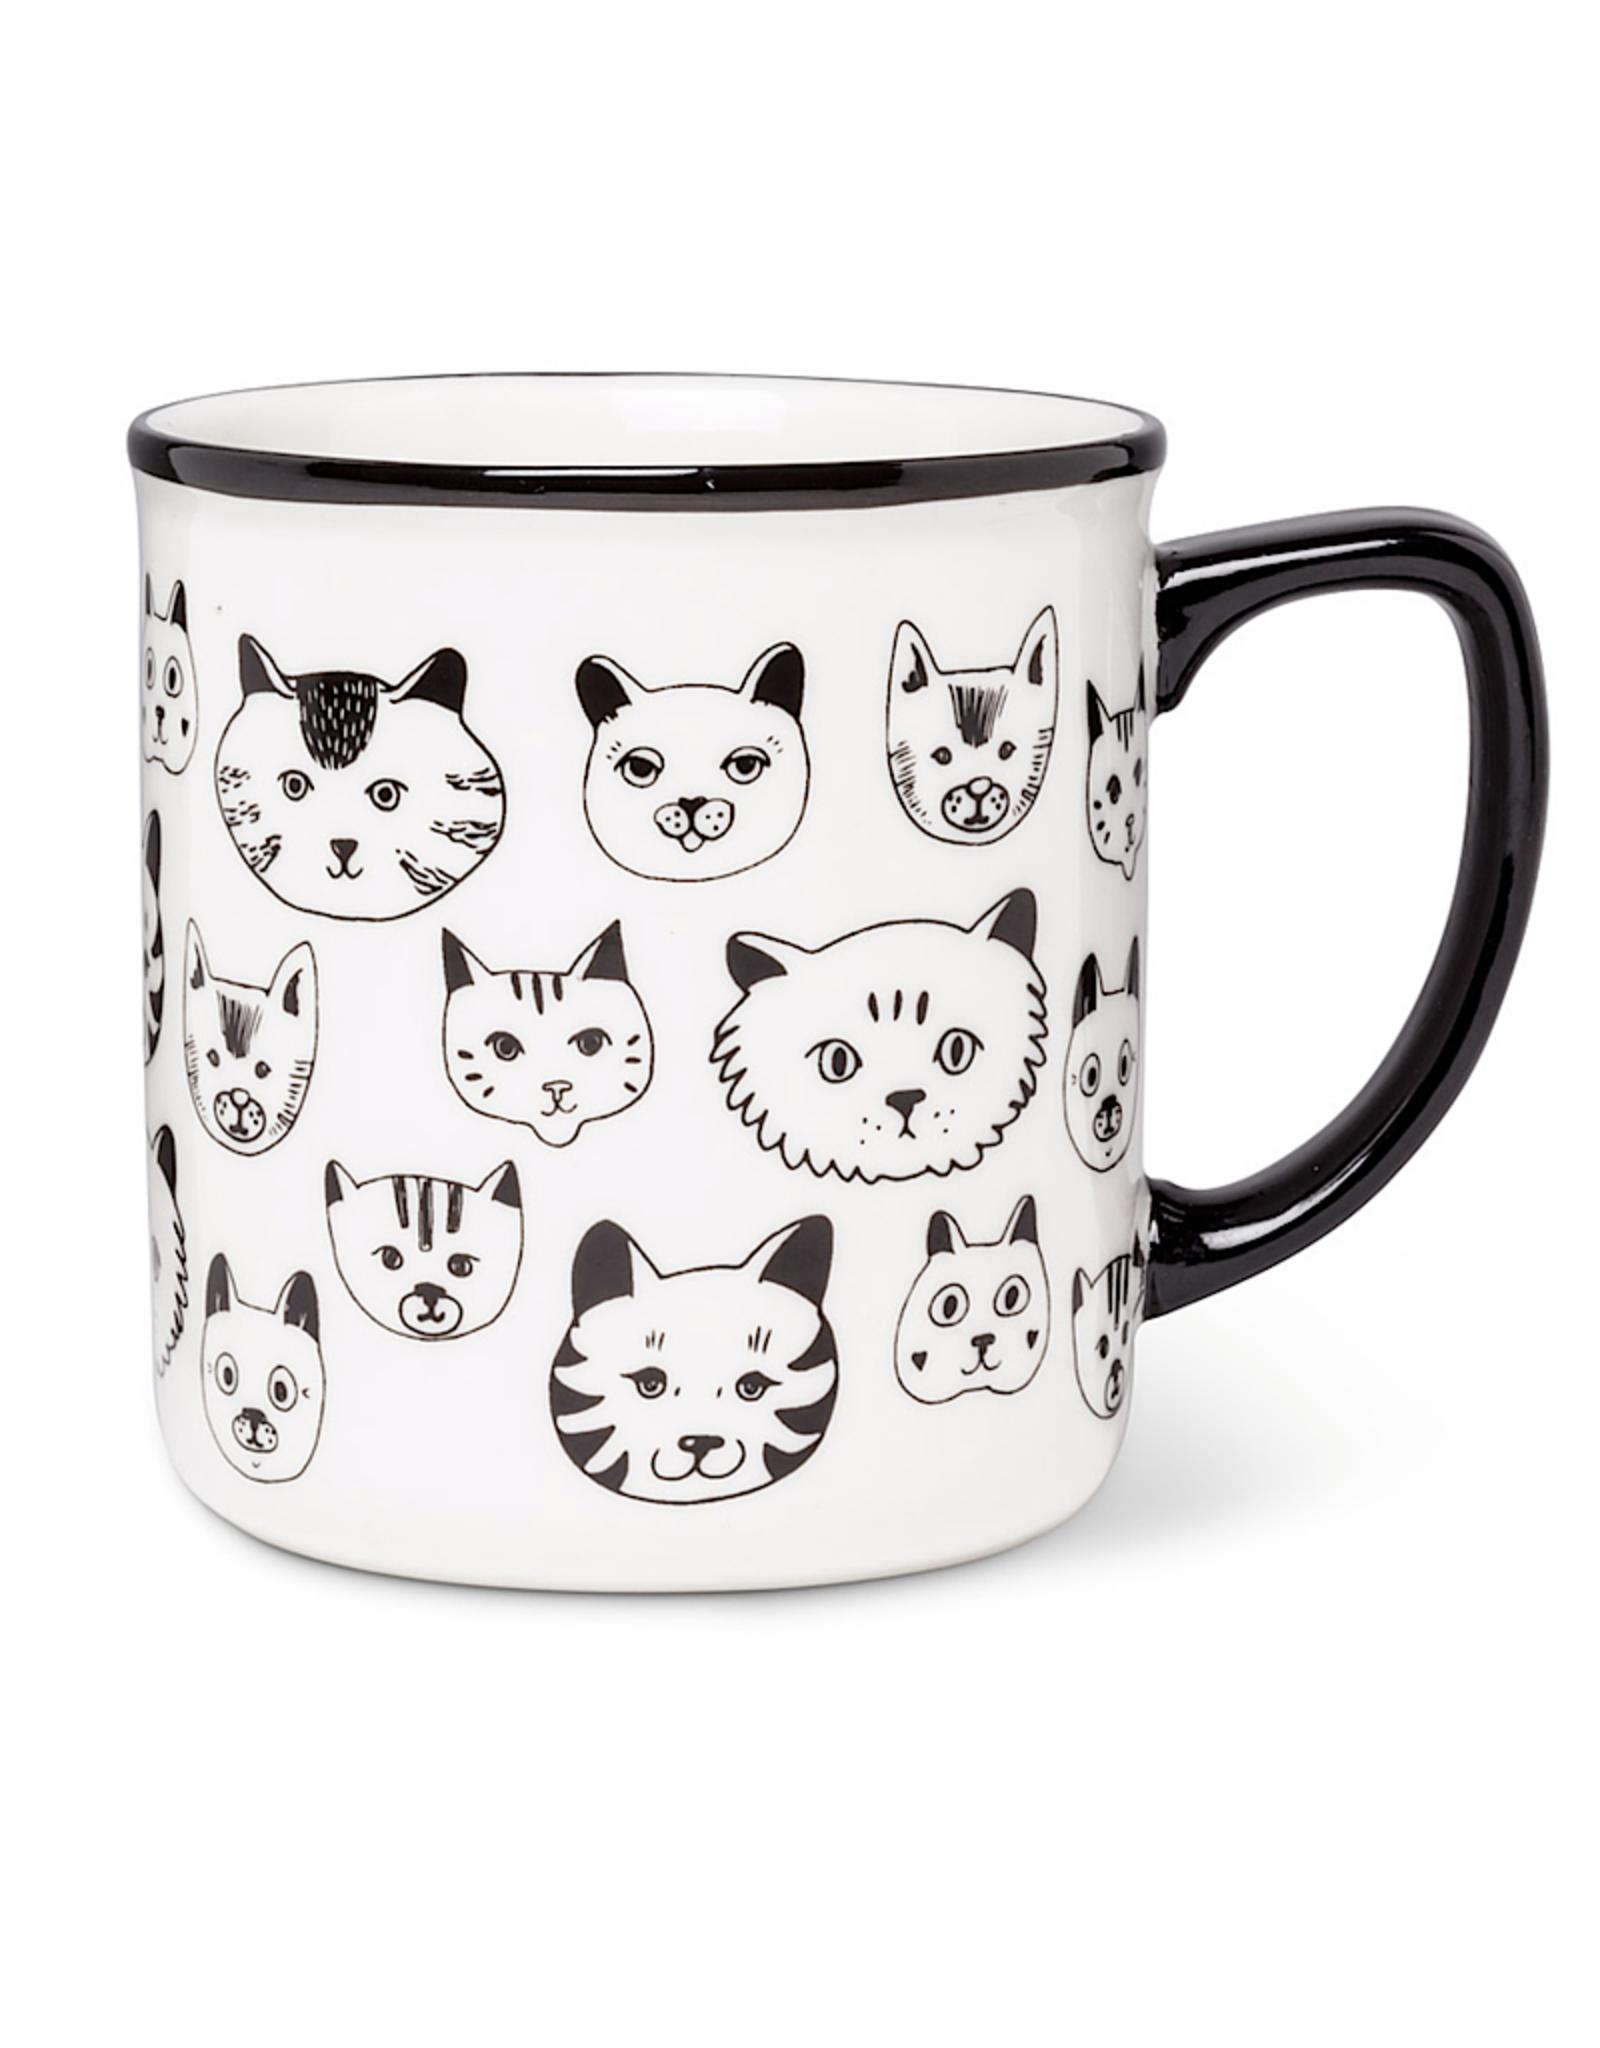 Simple Cat Faces Mug 4 14oz A Monkey Tree Emporium